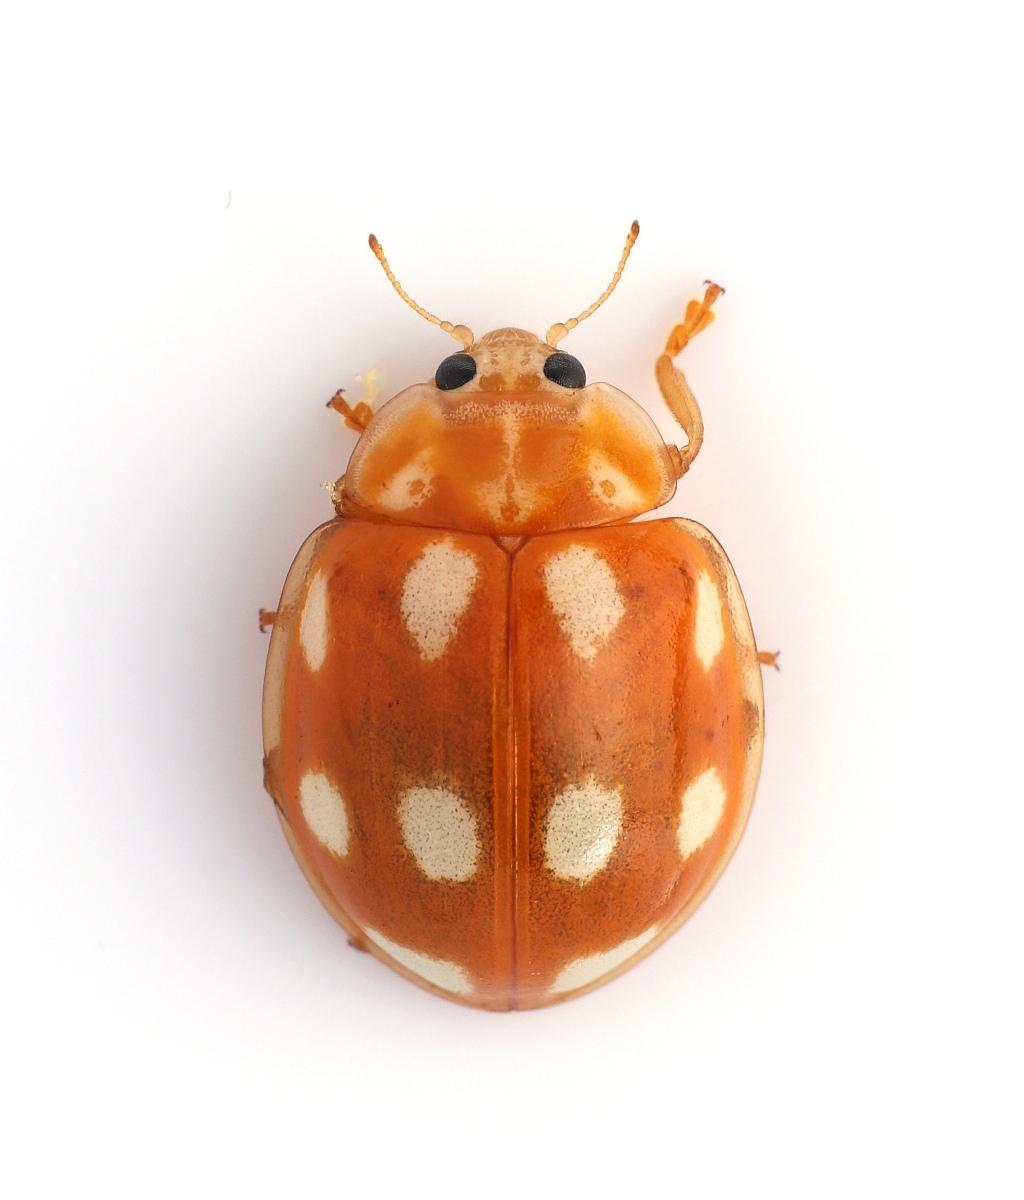 Foto/billede af Calvia decemguttata (Calvia decemguttata)